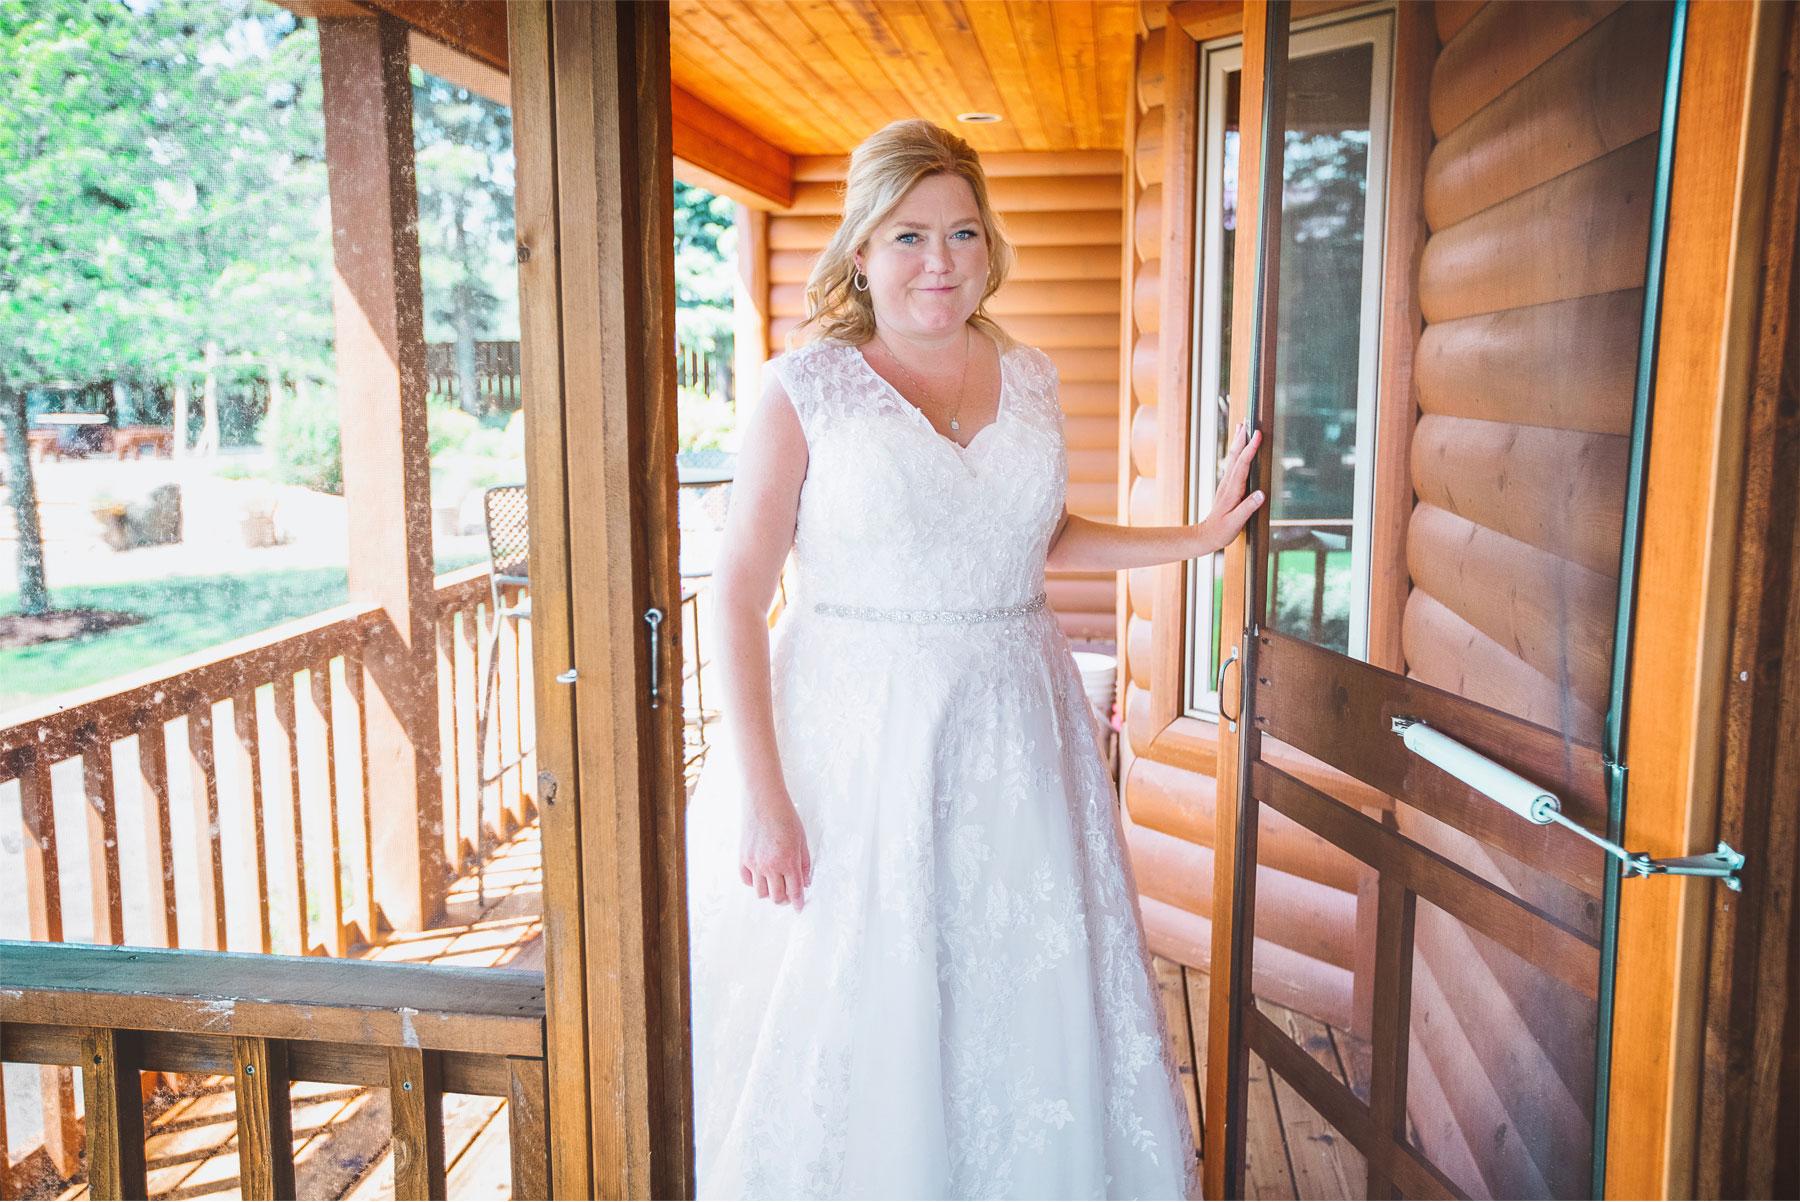 01-Vick-Photography-Wedding-Brainerd-Minnesota-Pine-Peaks-Lodge-Cabin-Rustic-Bride-Kristi-and-Noel.jpg